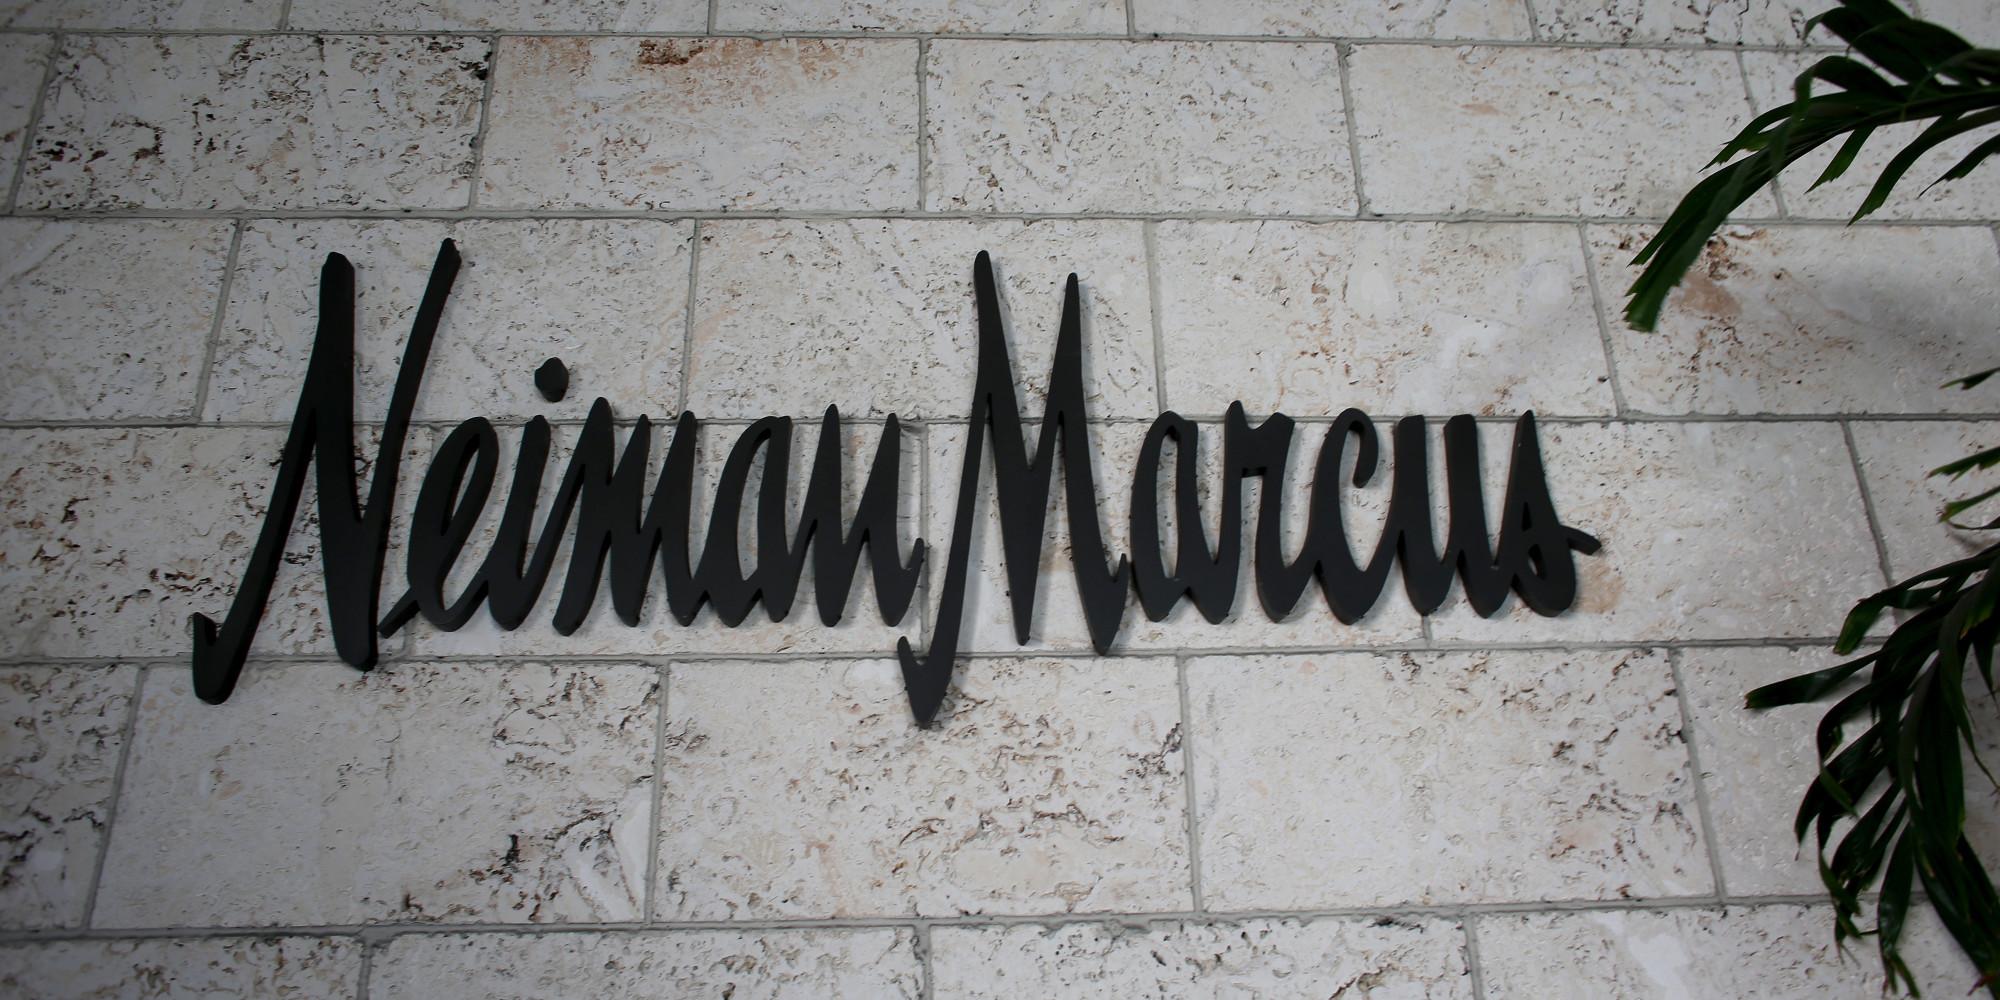 Neiman marcus credit card - Neiman Marcus Credit Card 29